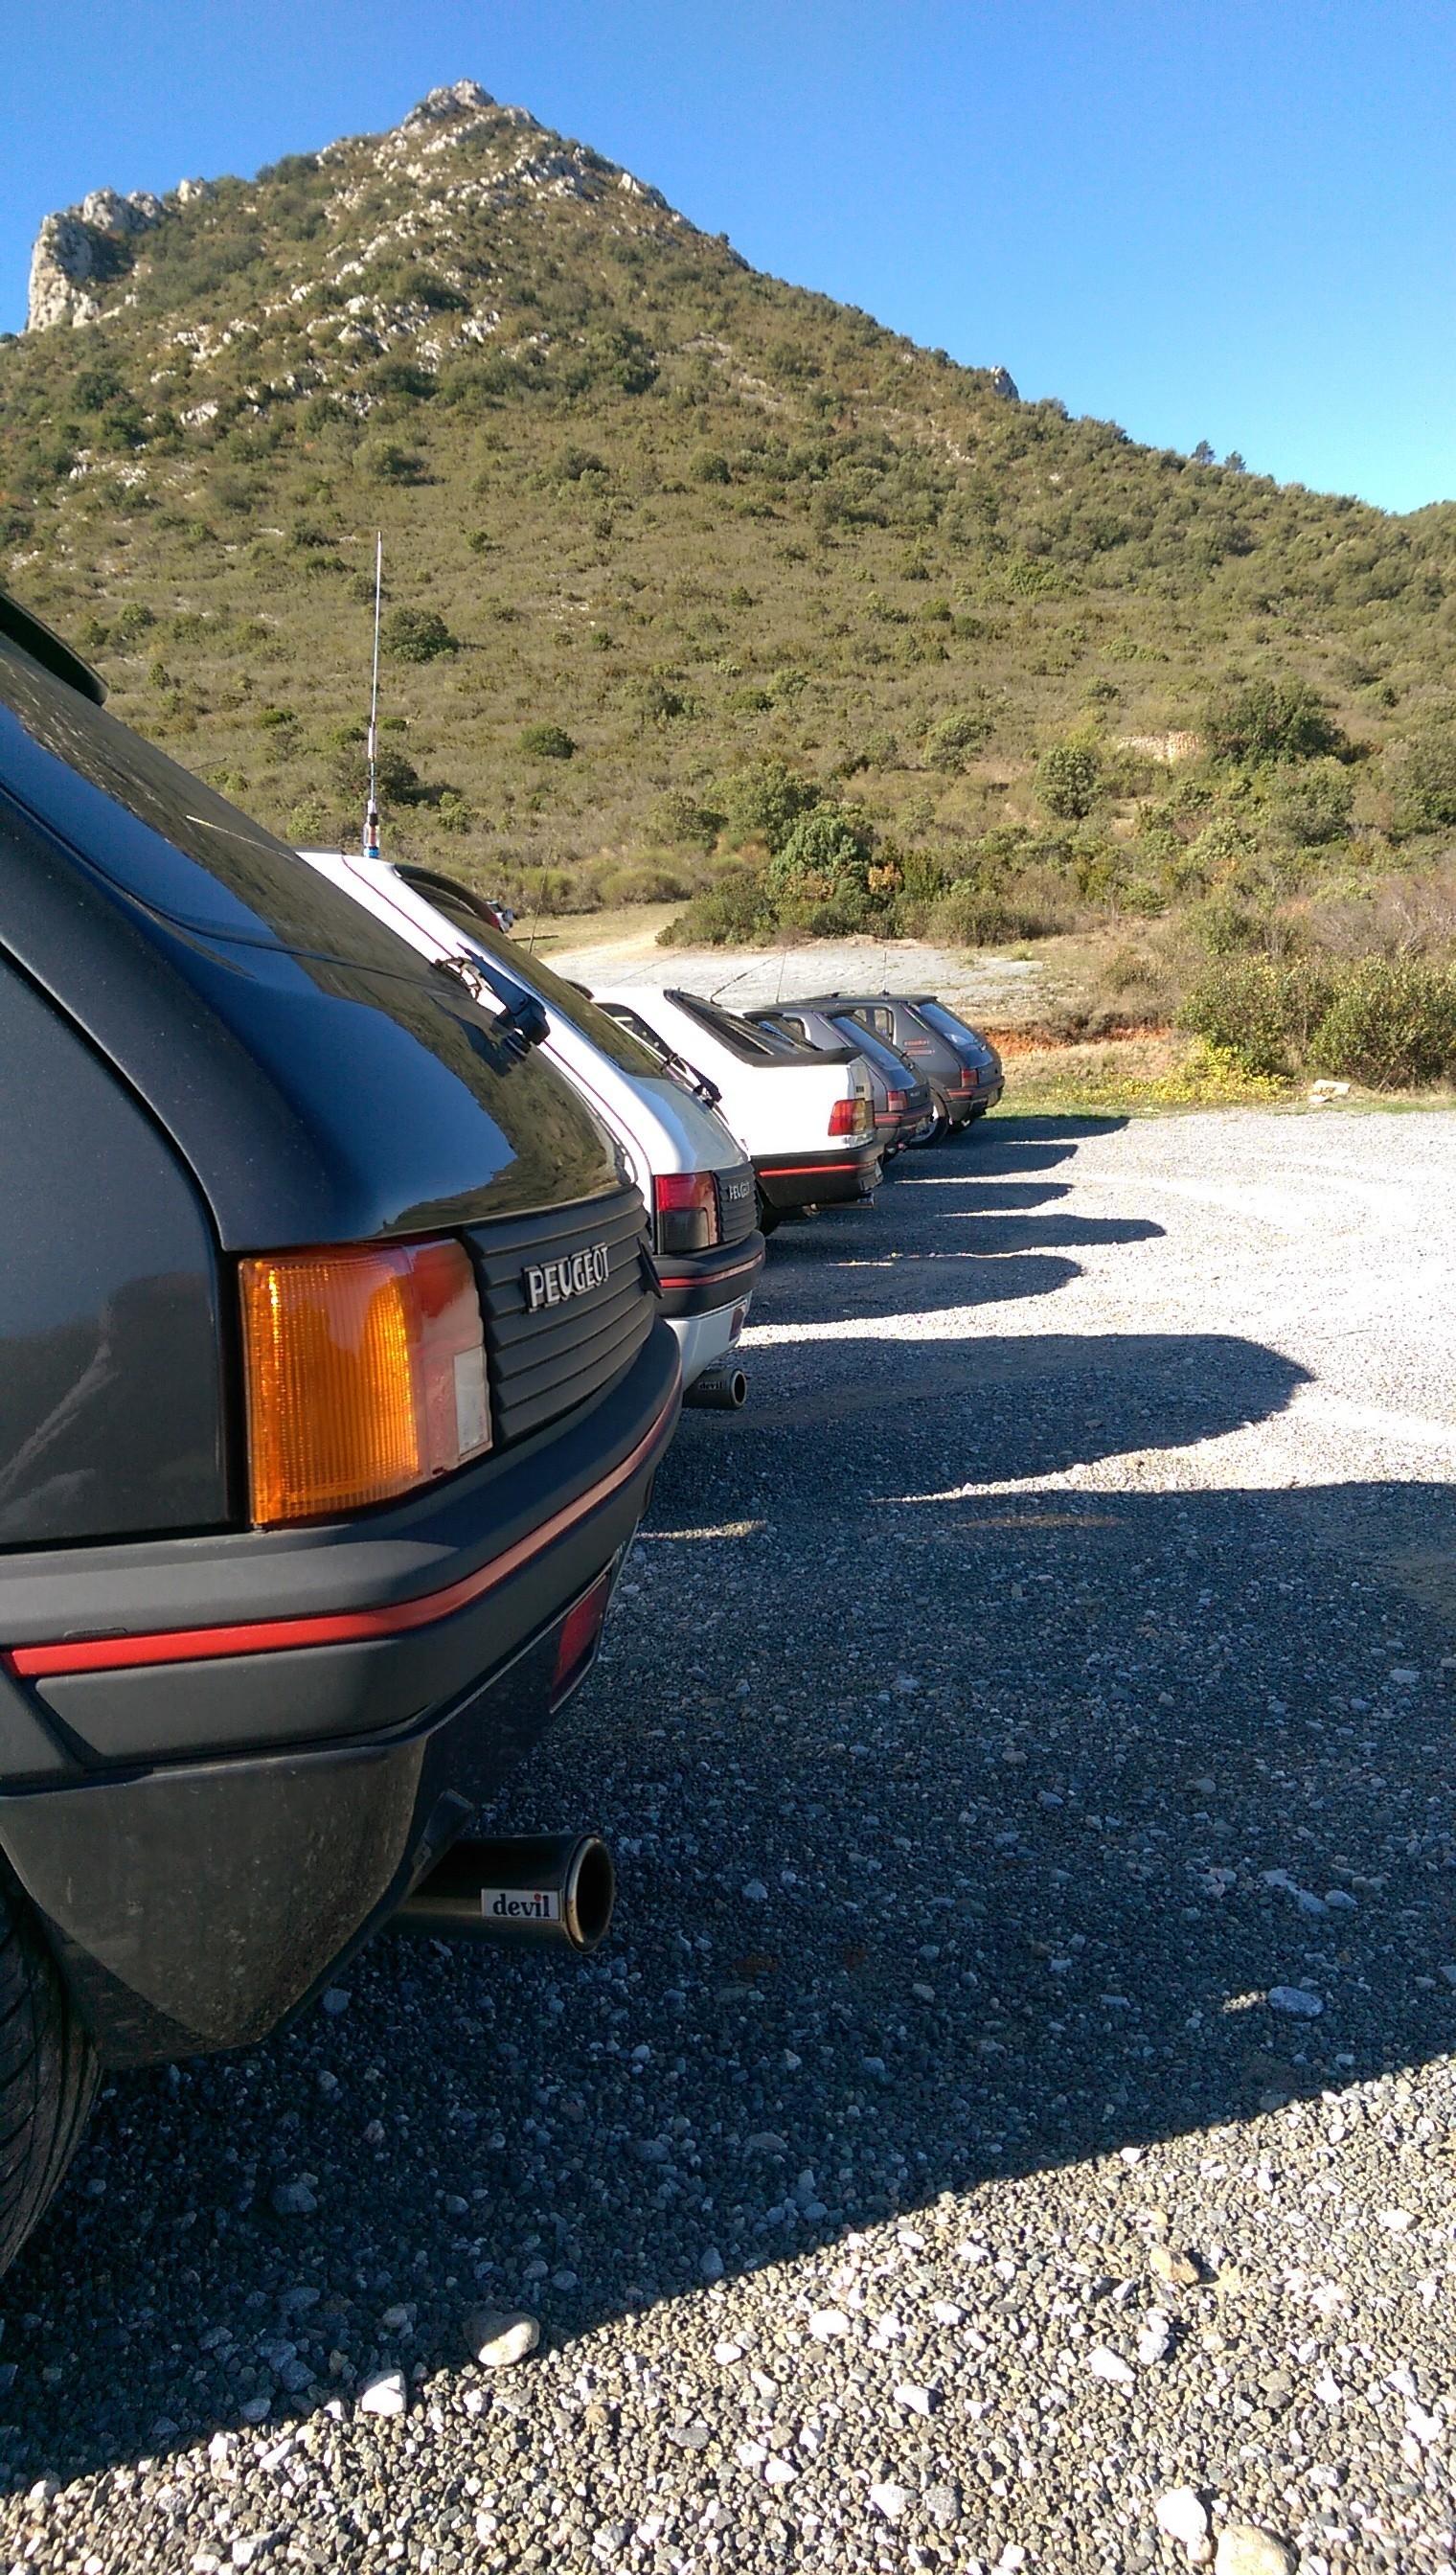 [toreto04] 205 GTI 1.6L - Gris Graphite - 1988 - Page 32 SfxNmj